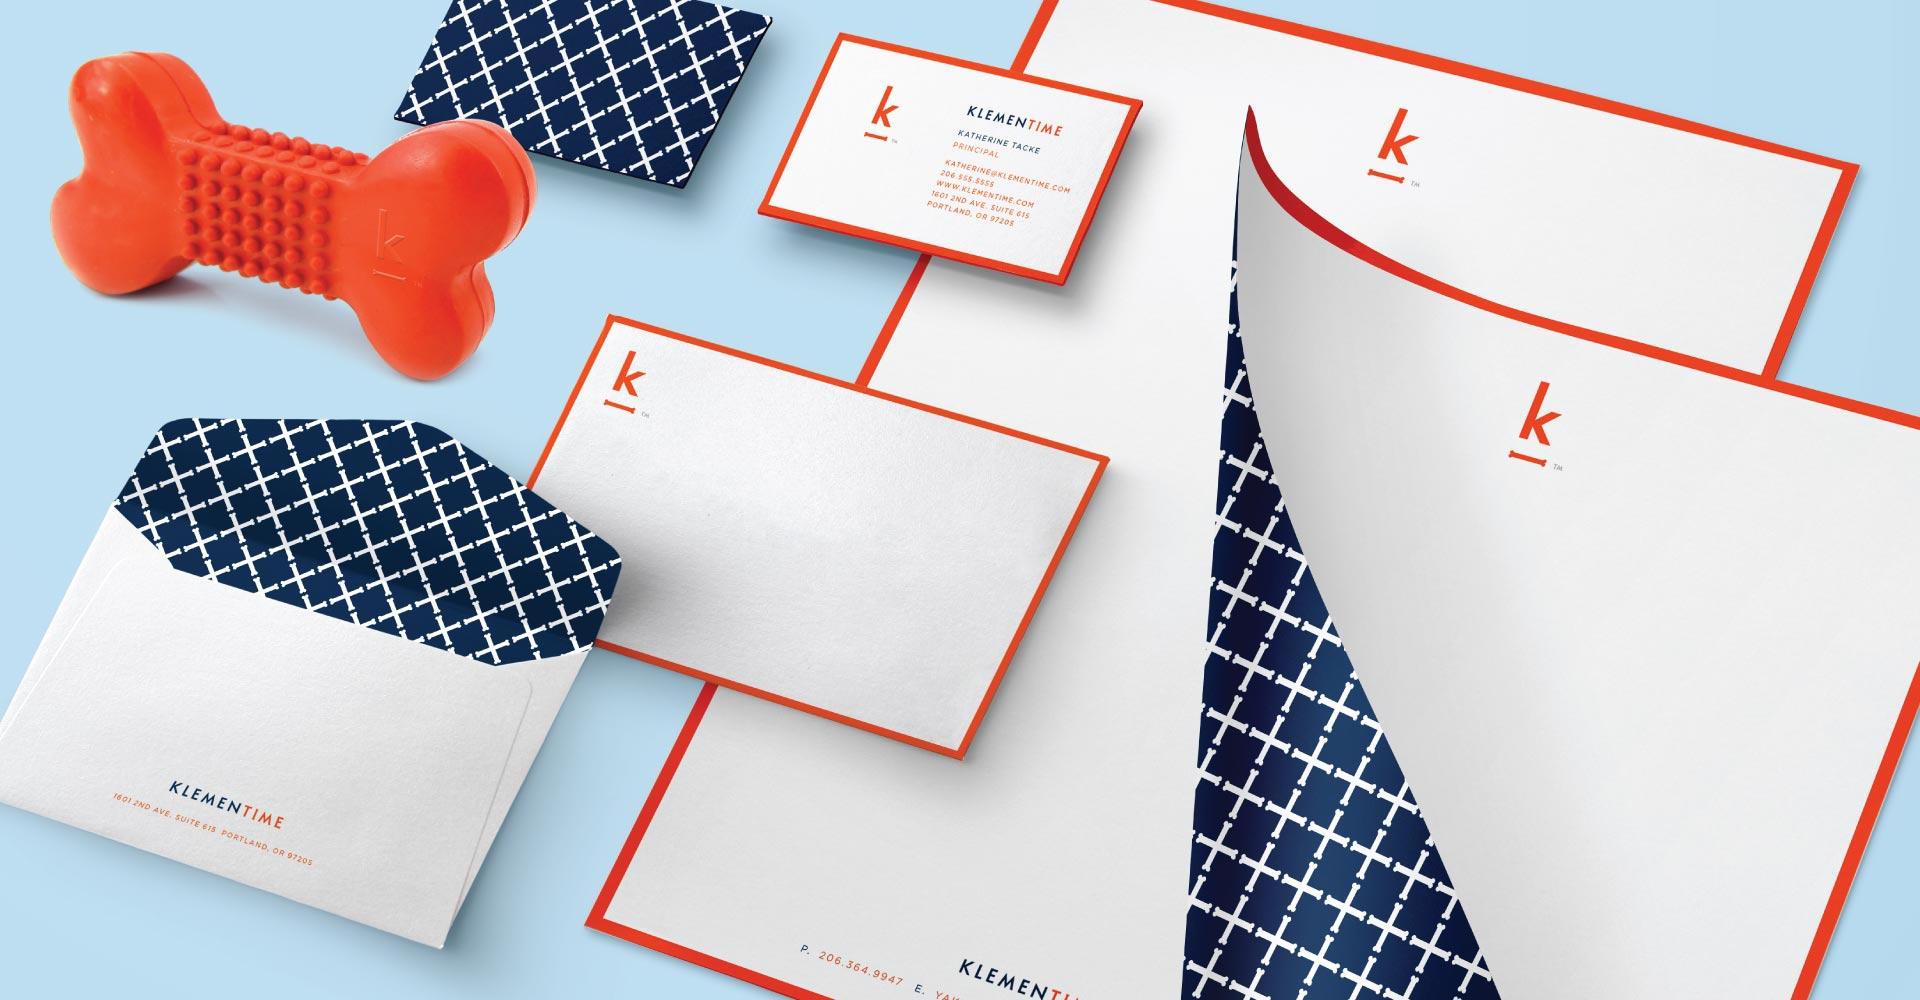 Creative_Retail_Packaging_Branding_Identity_Design_Klementime_05.jpg